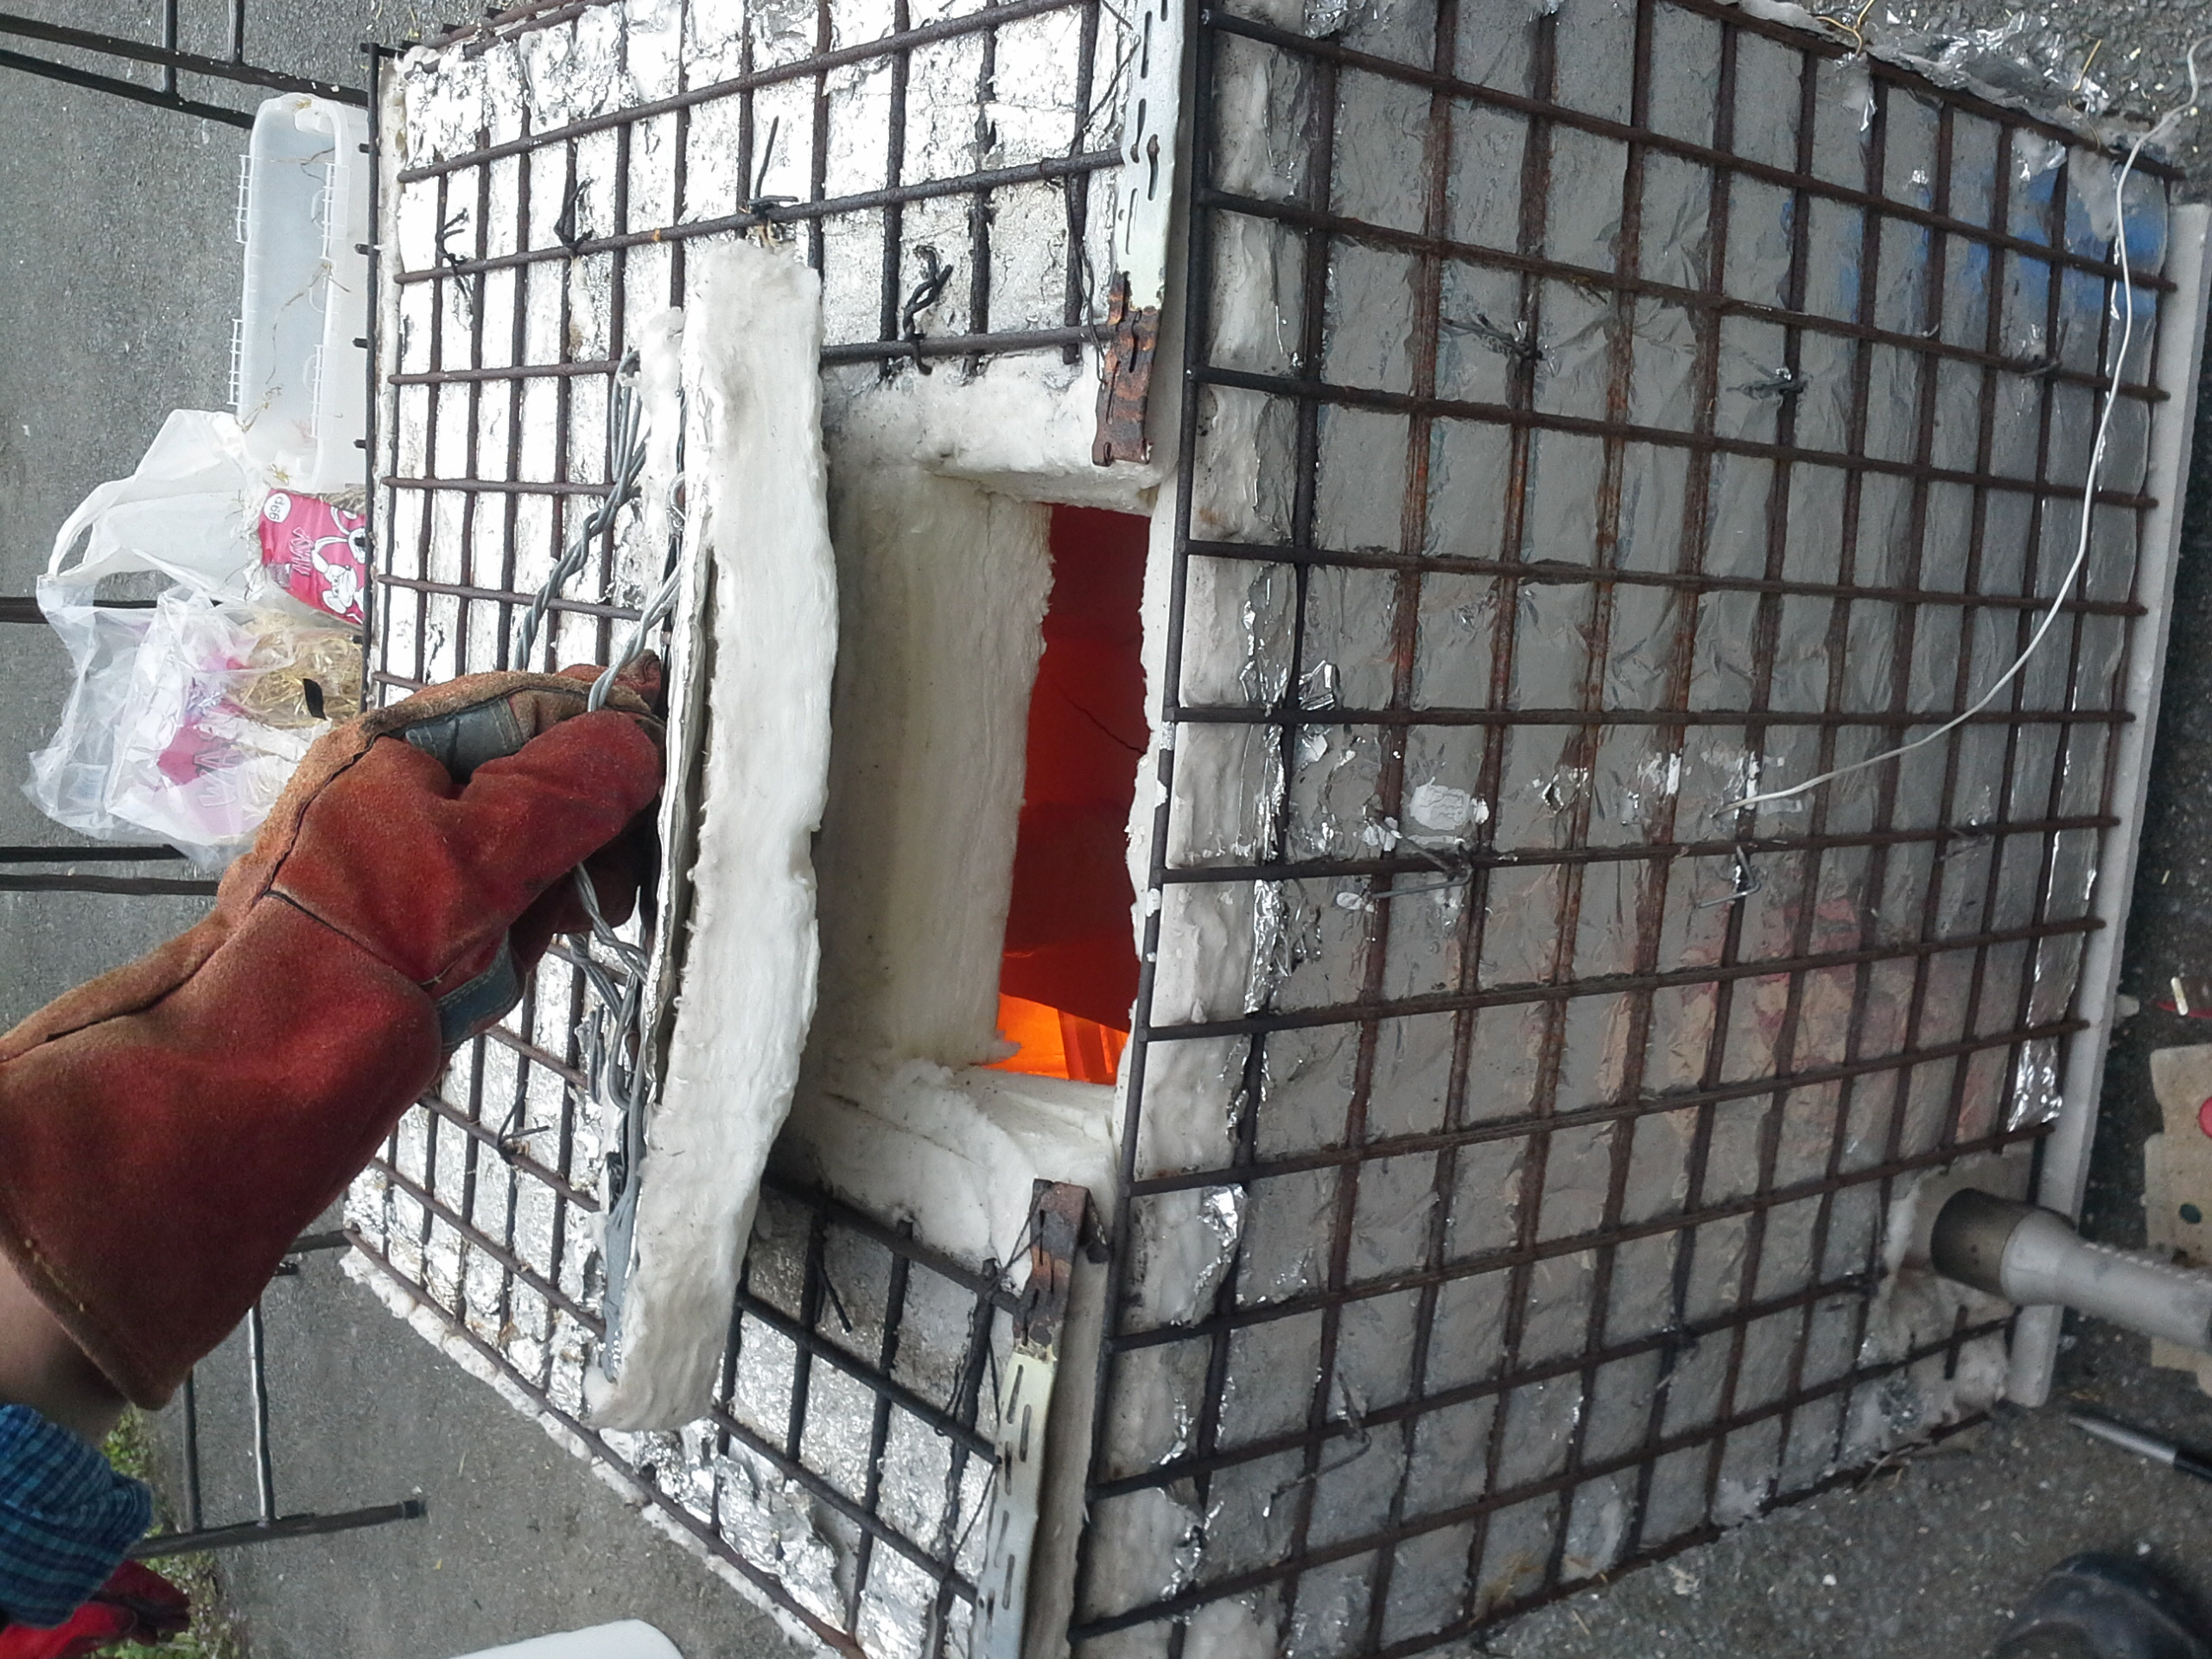 Checking the kiln